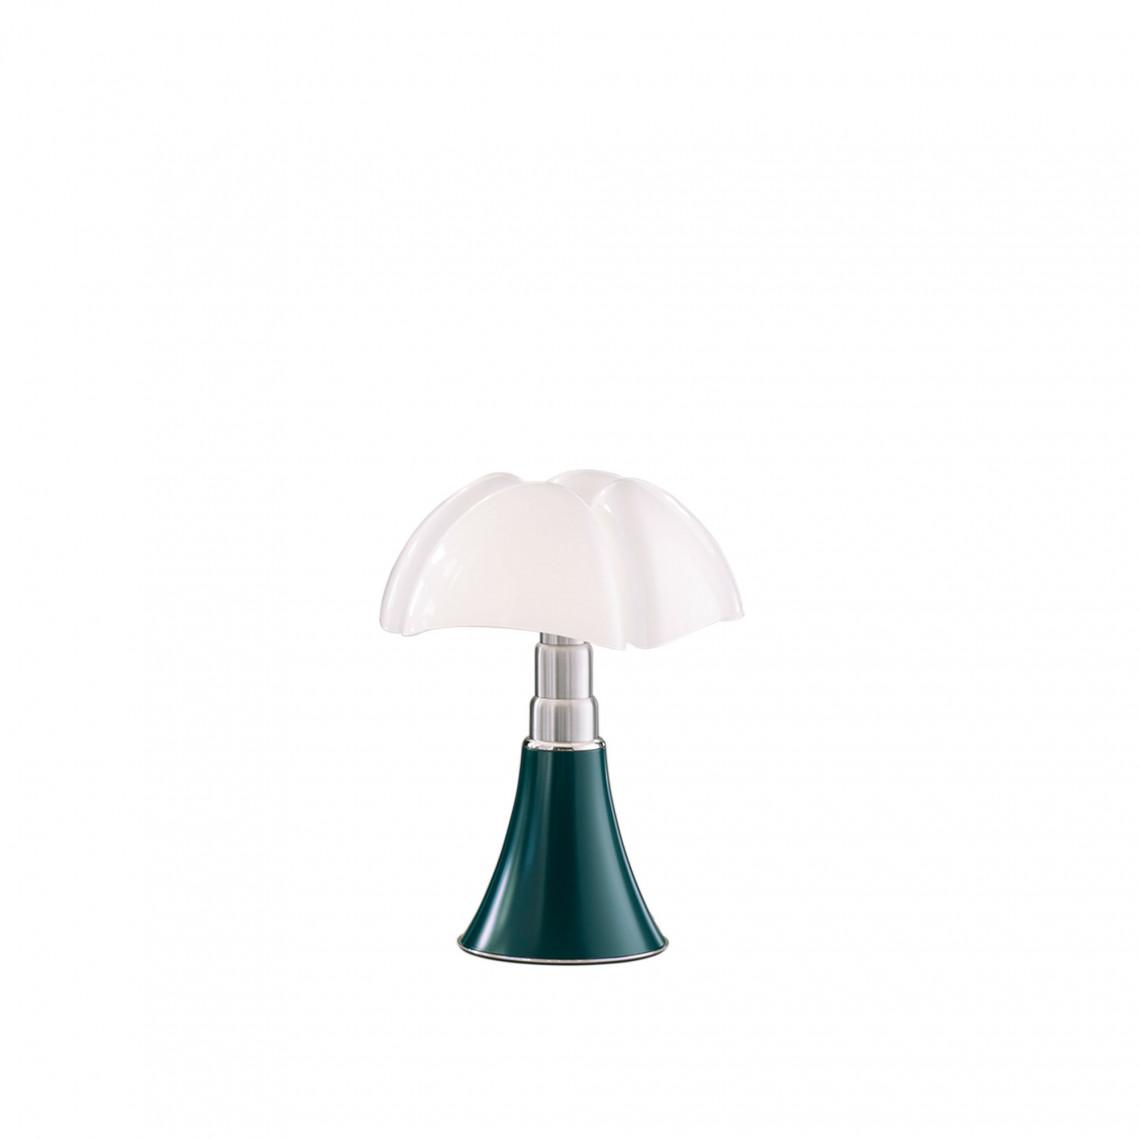 Minipipistrello Cordless Table Lamp, Agave Green - Dimbar